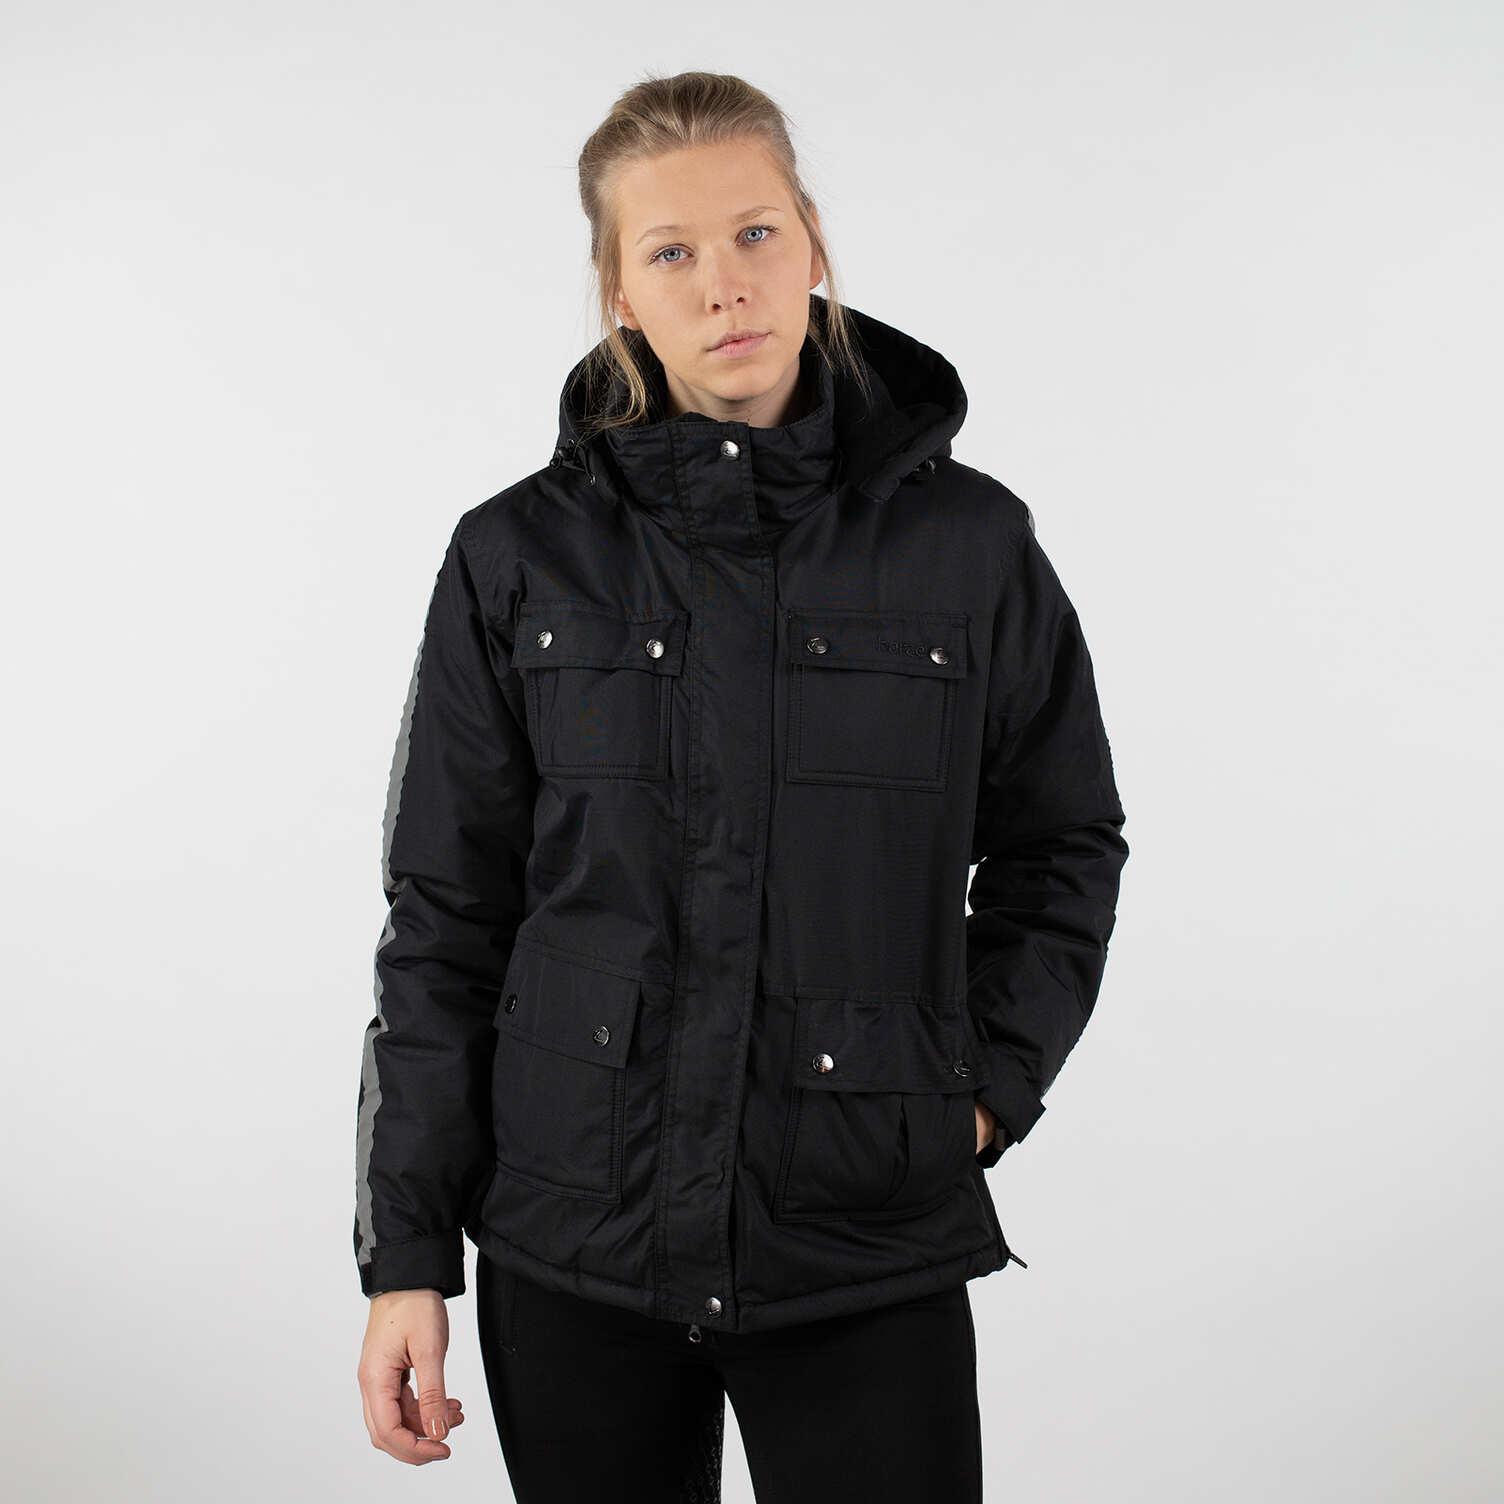 dd02b582e51 Horze Winter Rider Jacket